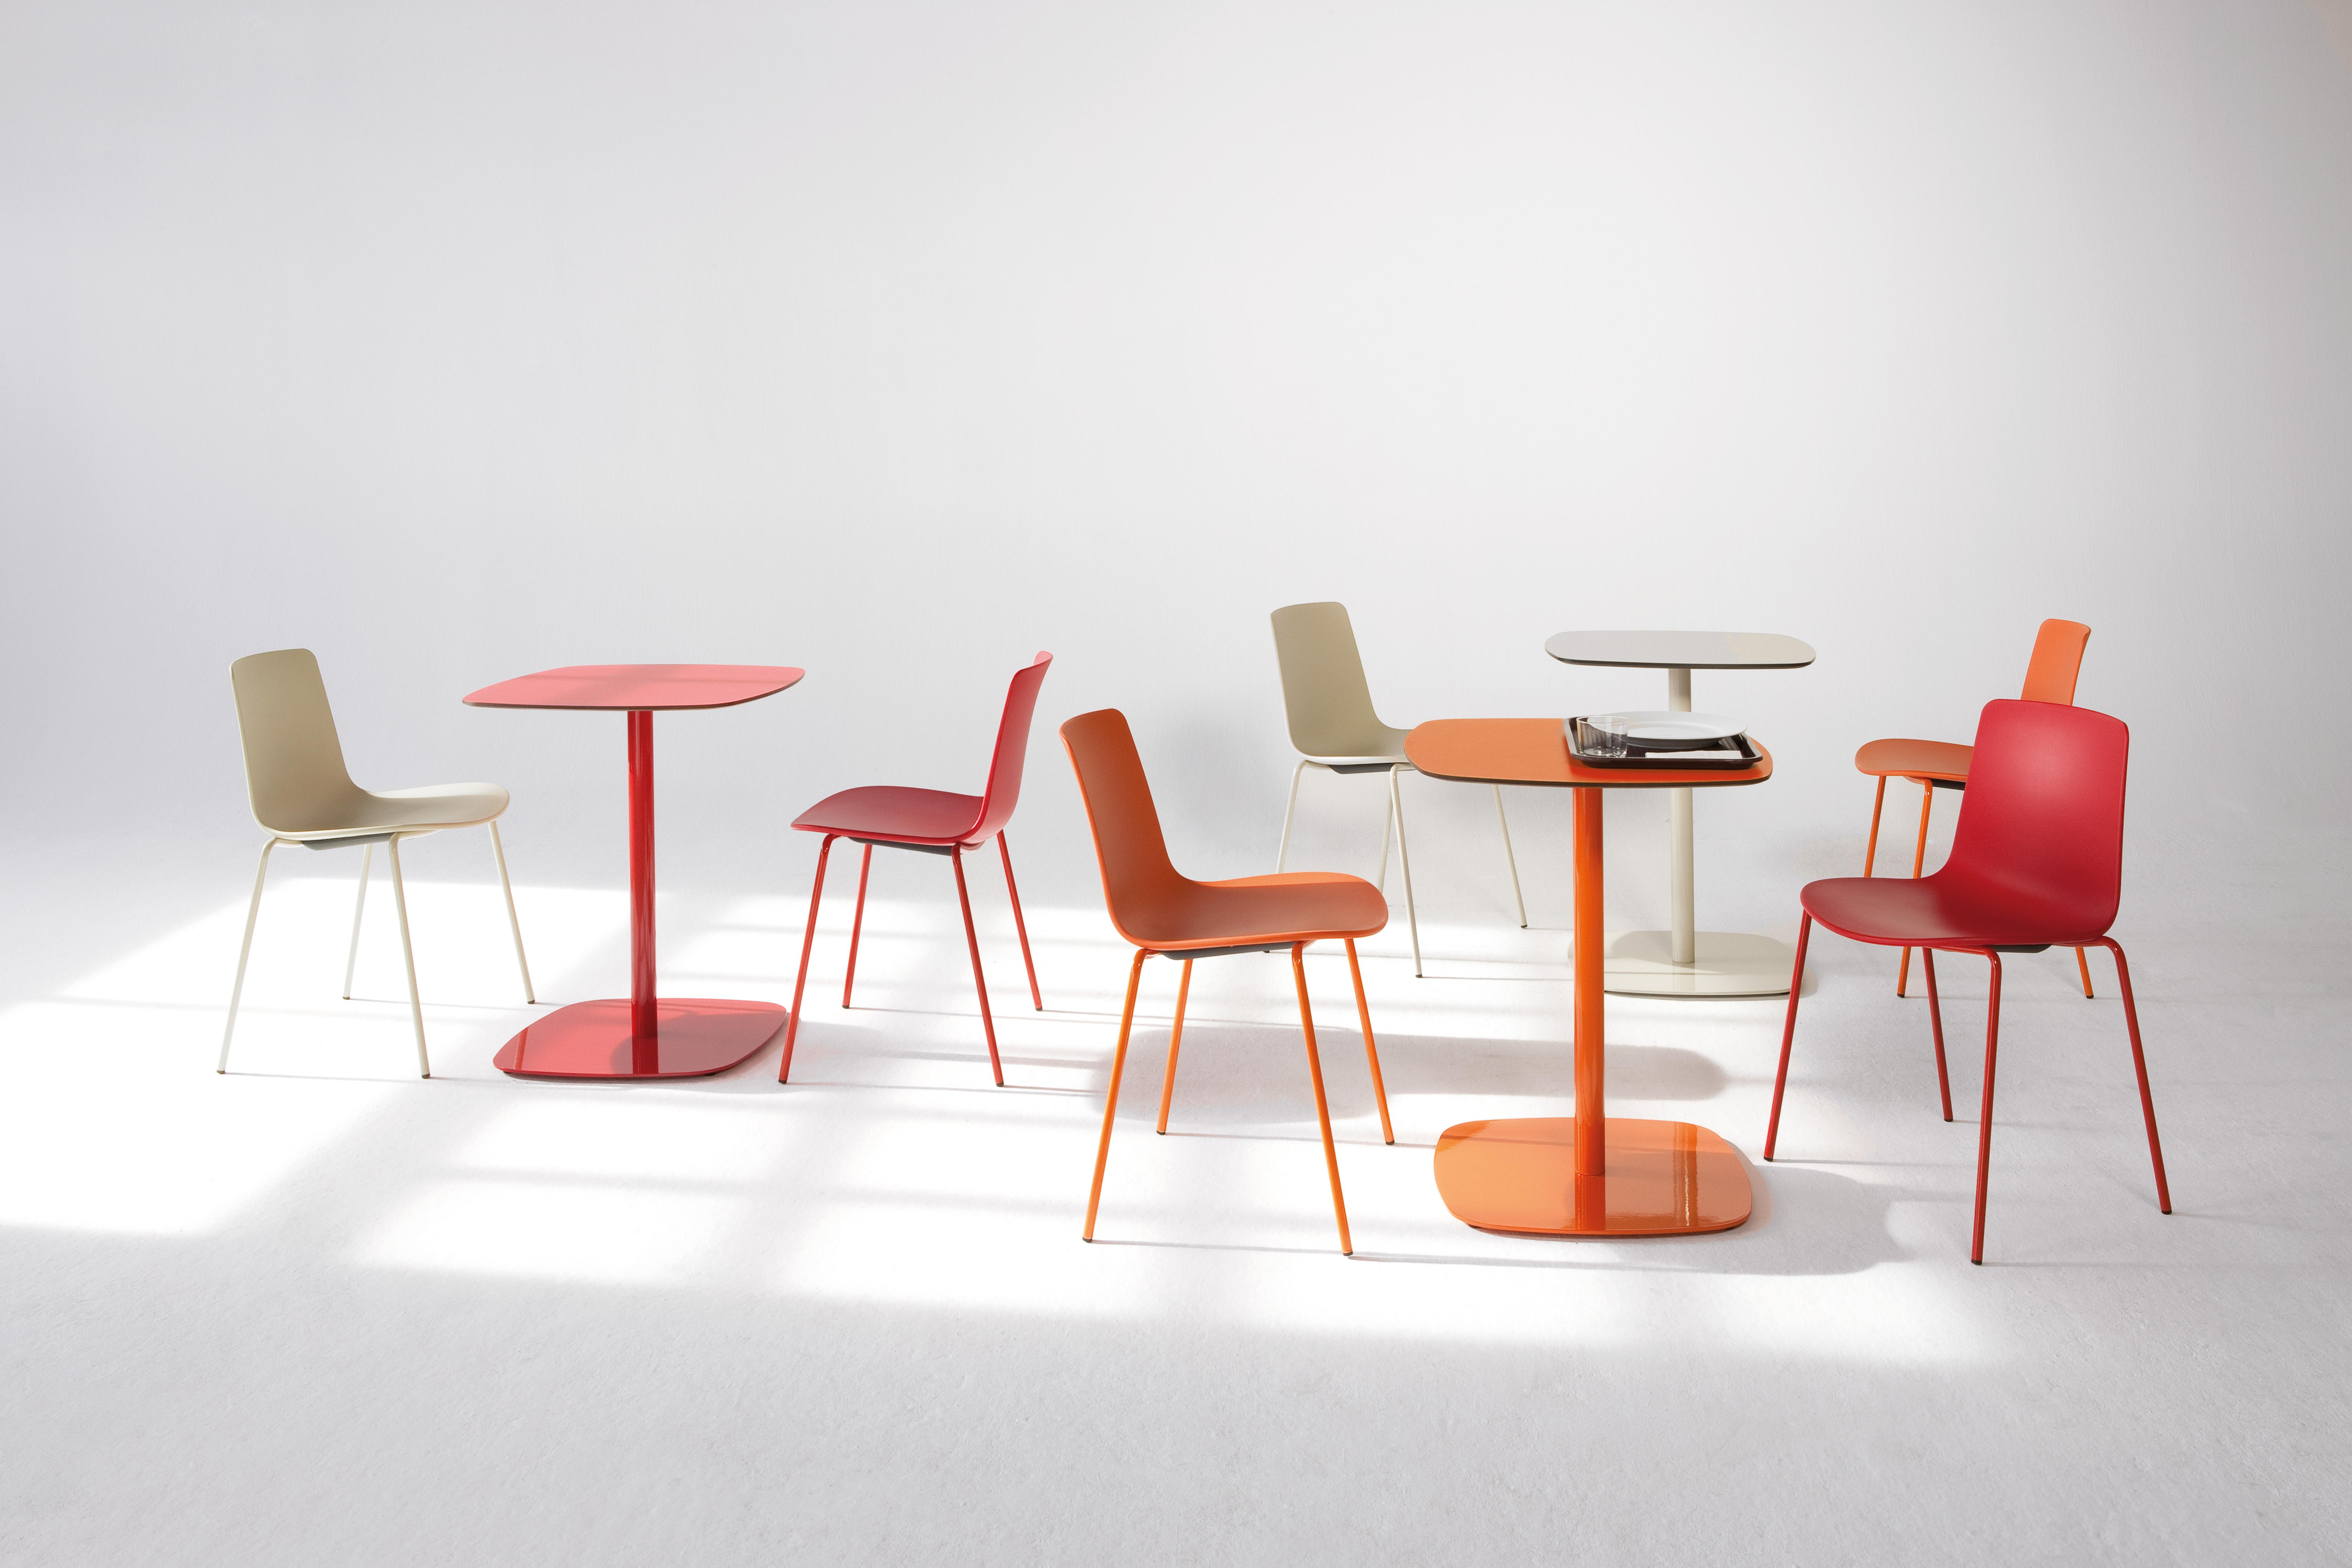 KE-ZU_ENEA_Lottus Chair_healthcare furniture